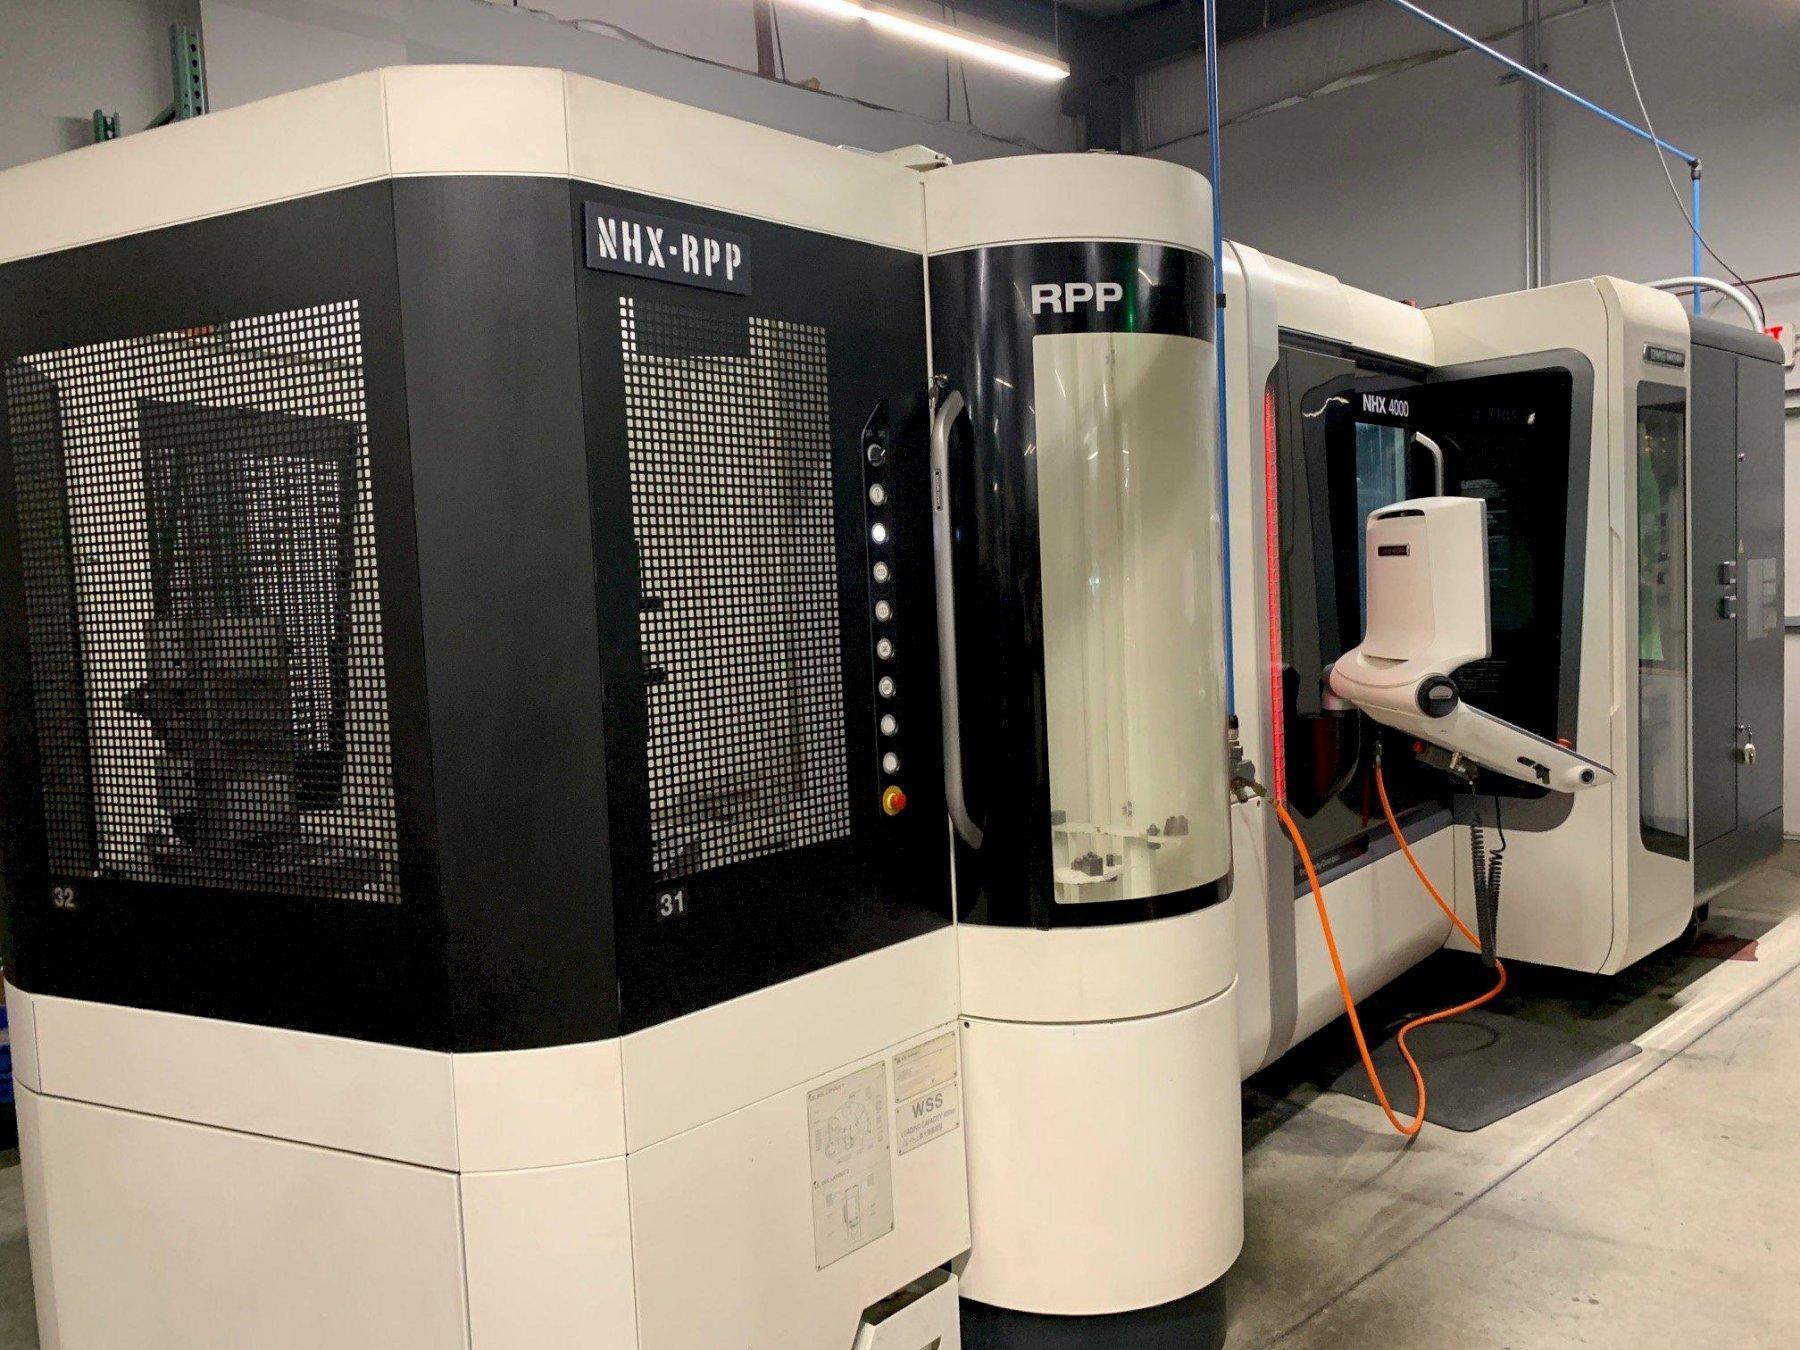 "Mori Seiki NHX-4000 Gen2 RPP, M700BM Celos CNC Control, (5) 16""x 16"" Pallets, X=22"",Y=22"",Z=22"", 15000 RPM, 120 ATC, Full 4th Axis, New 2015."